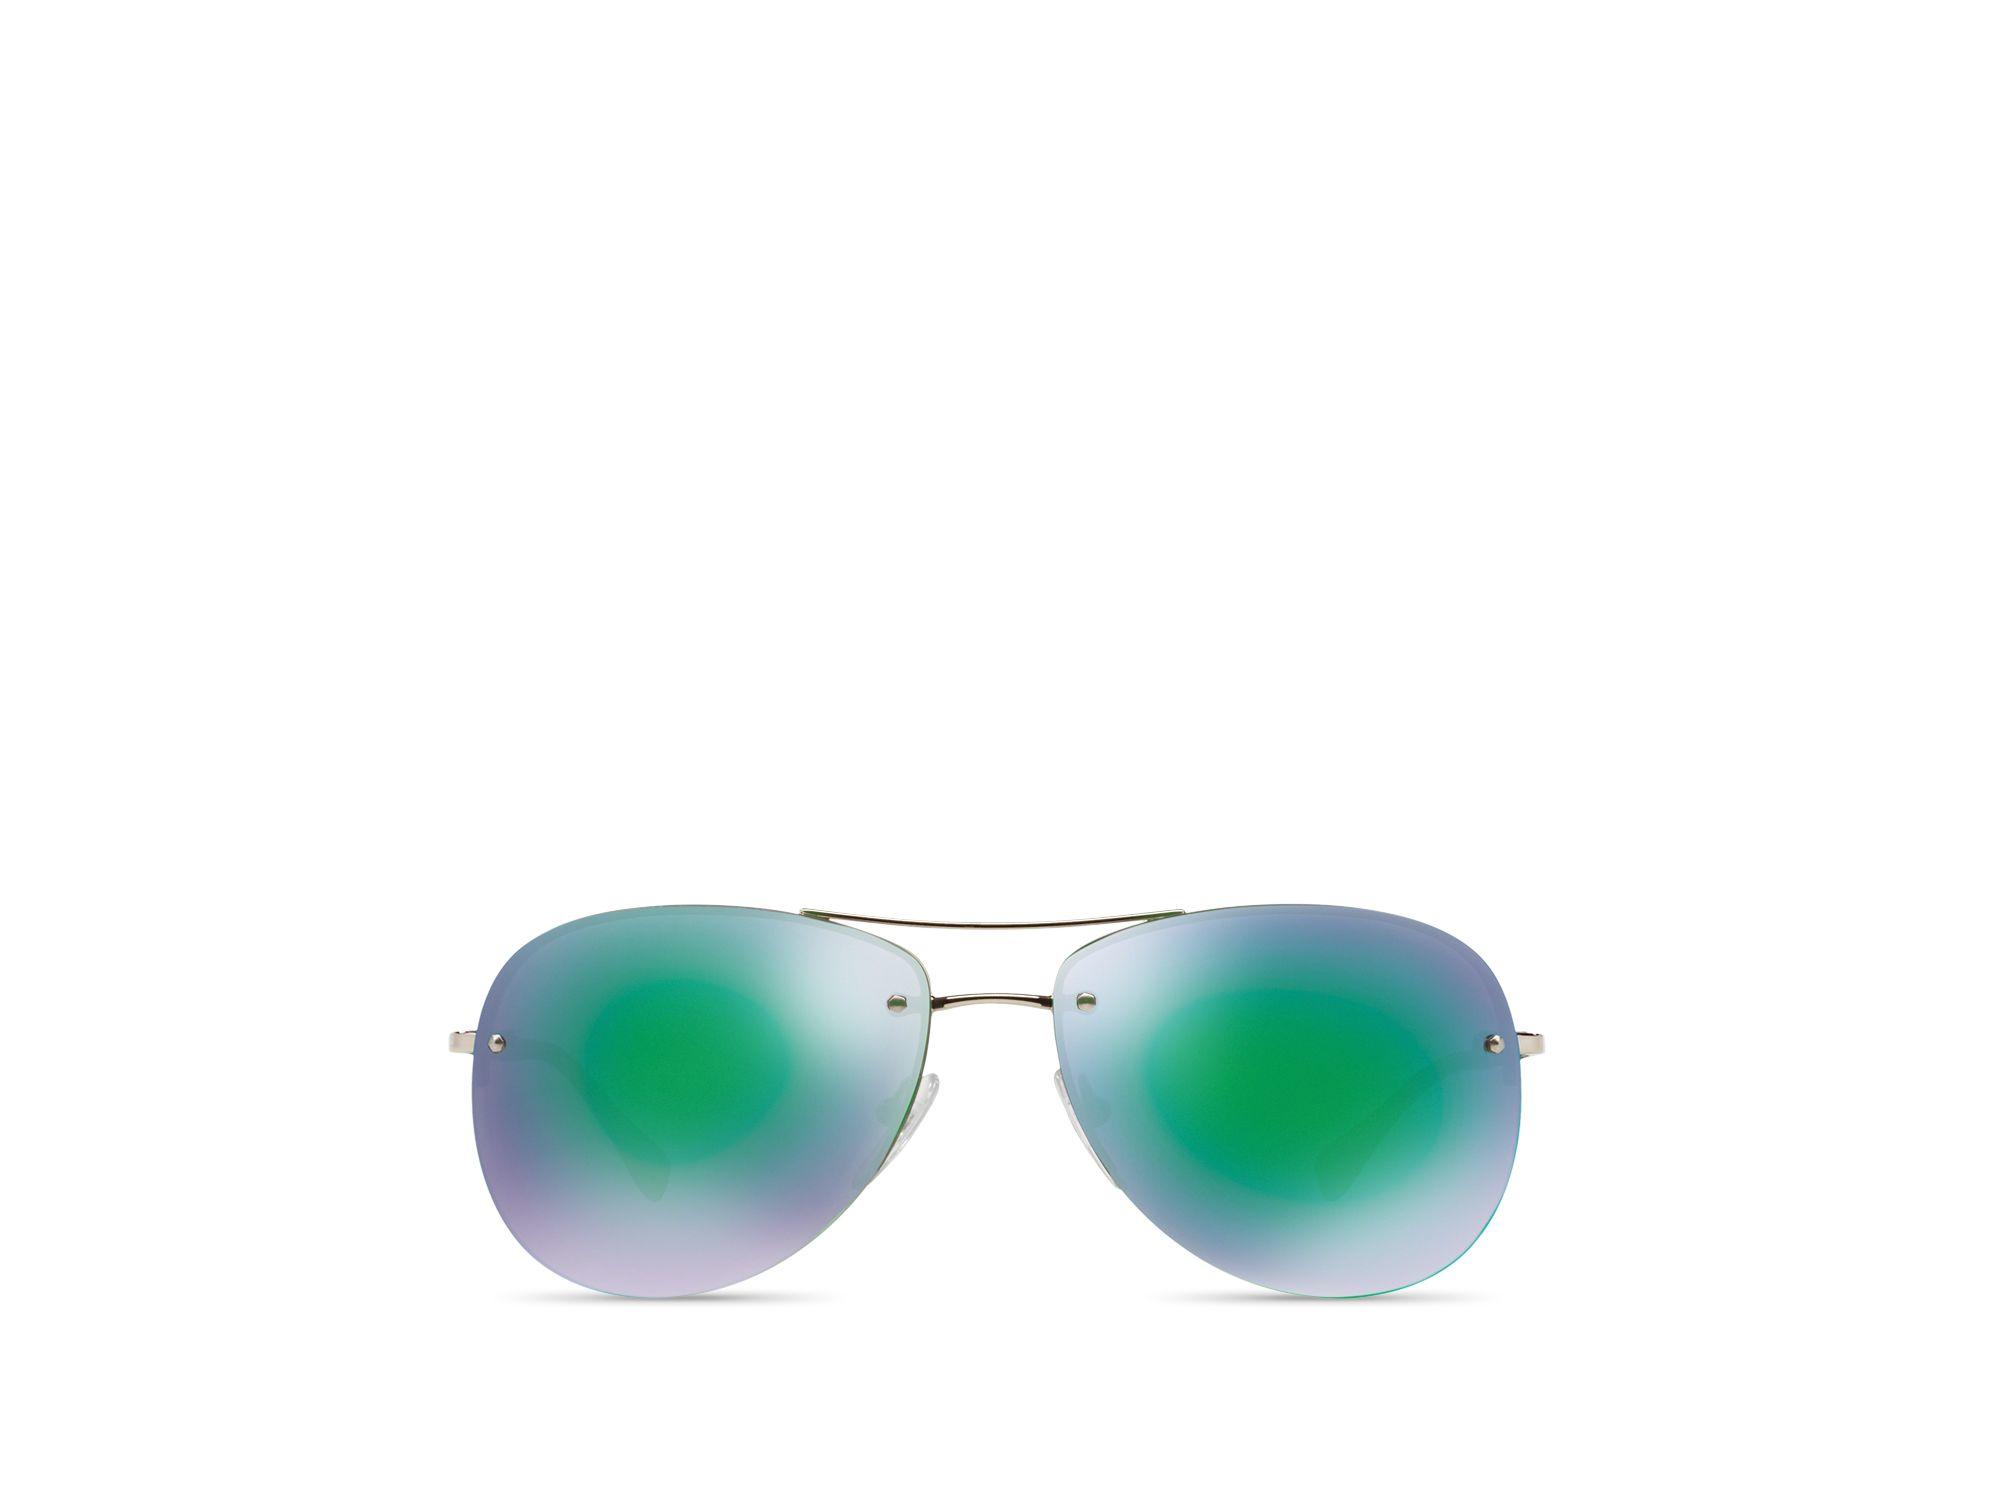 95c744d1a6ec1 Prada Rimless Aviator Sunglasses « Heritage Malta